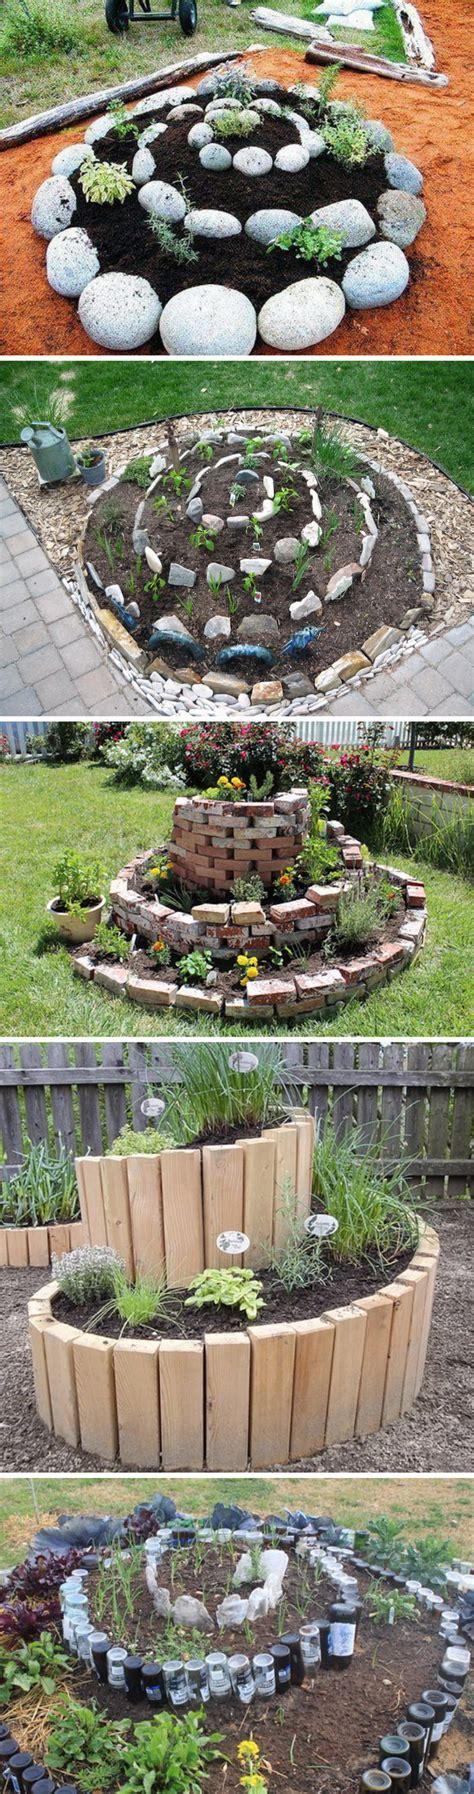 raised garden bed ideas hative